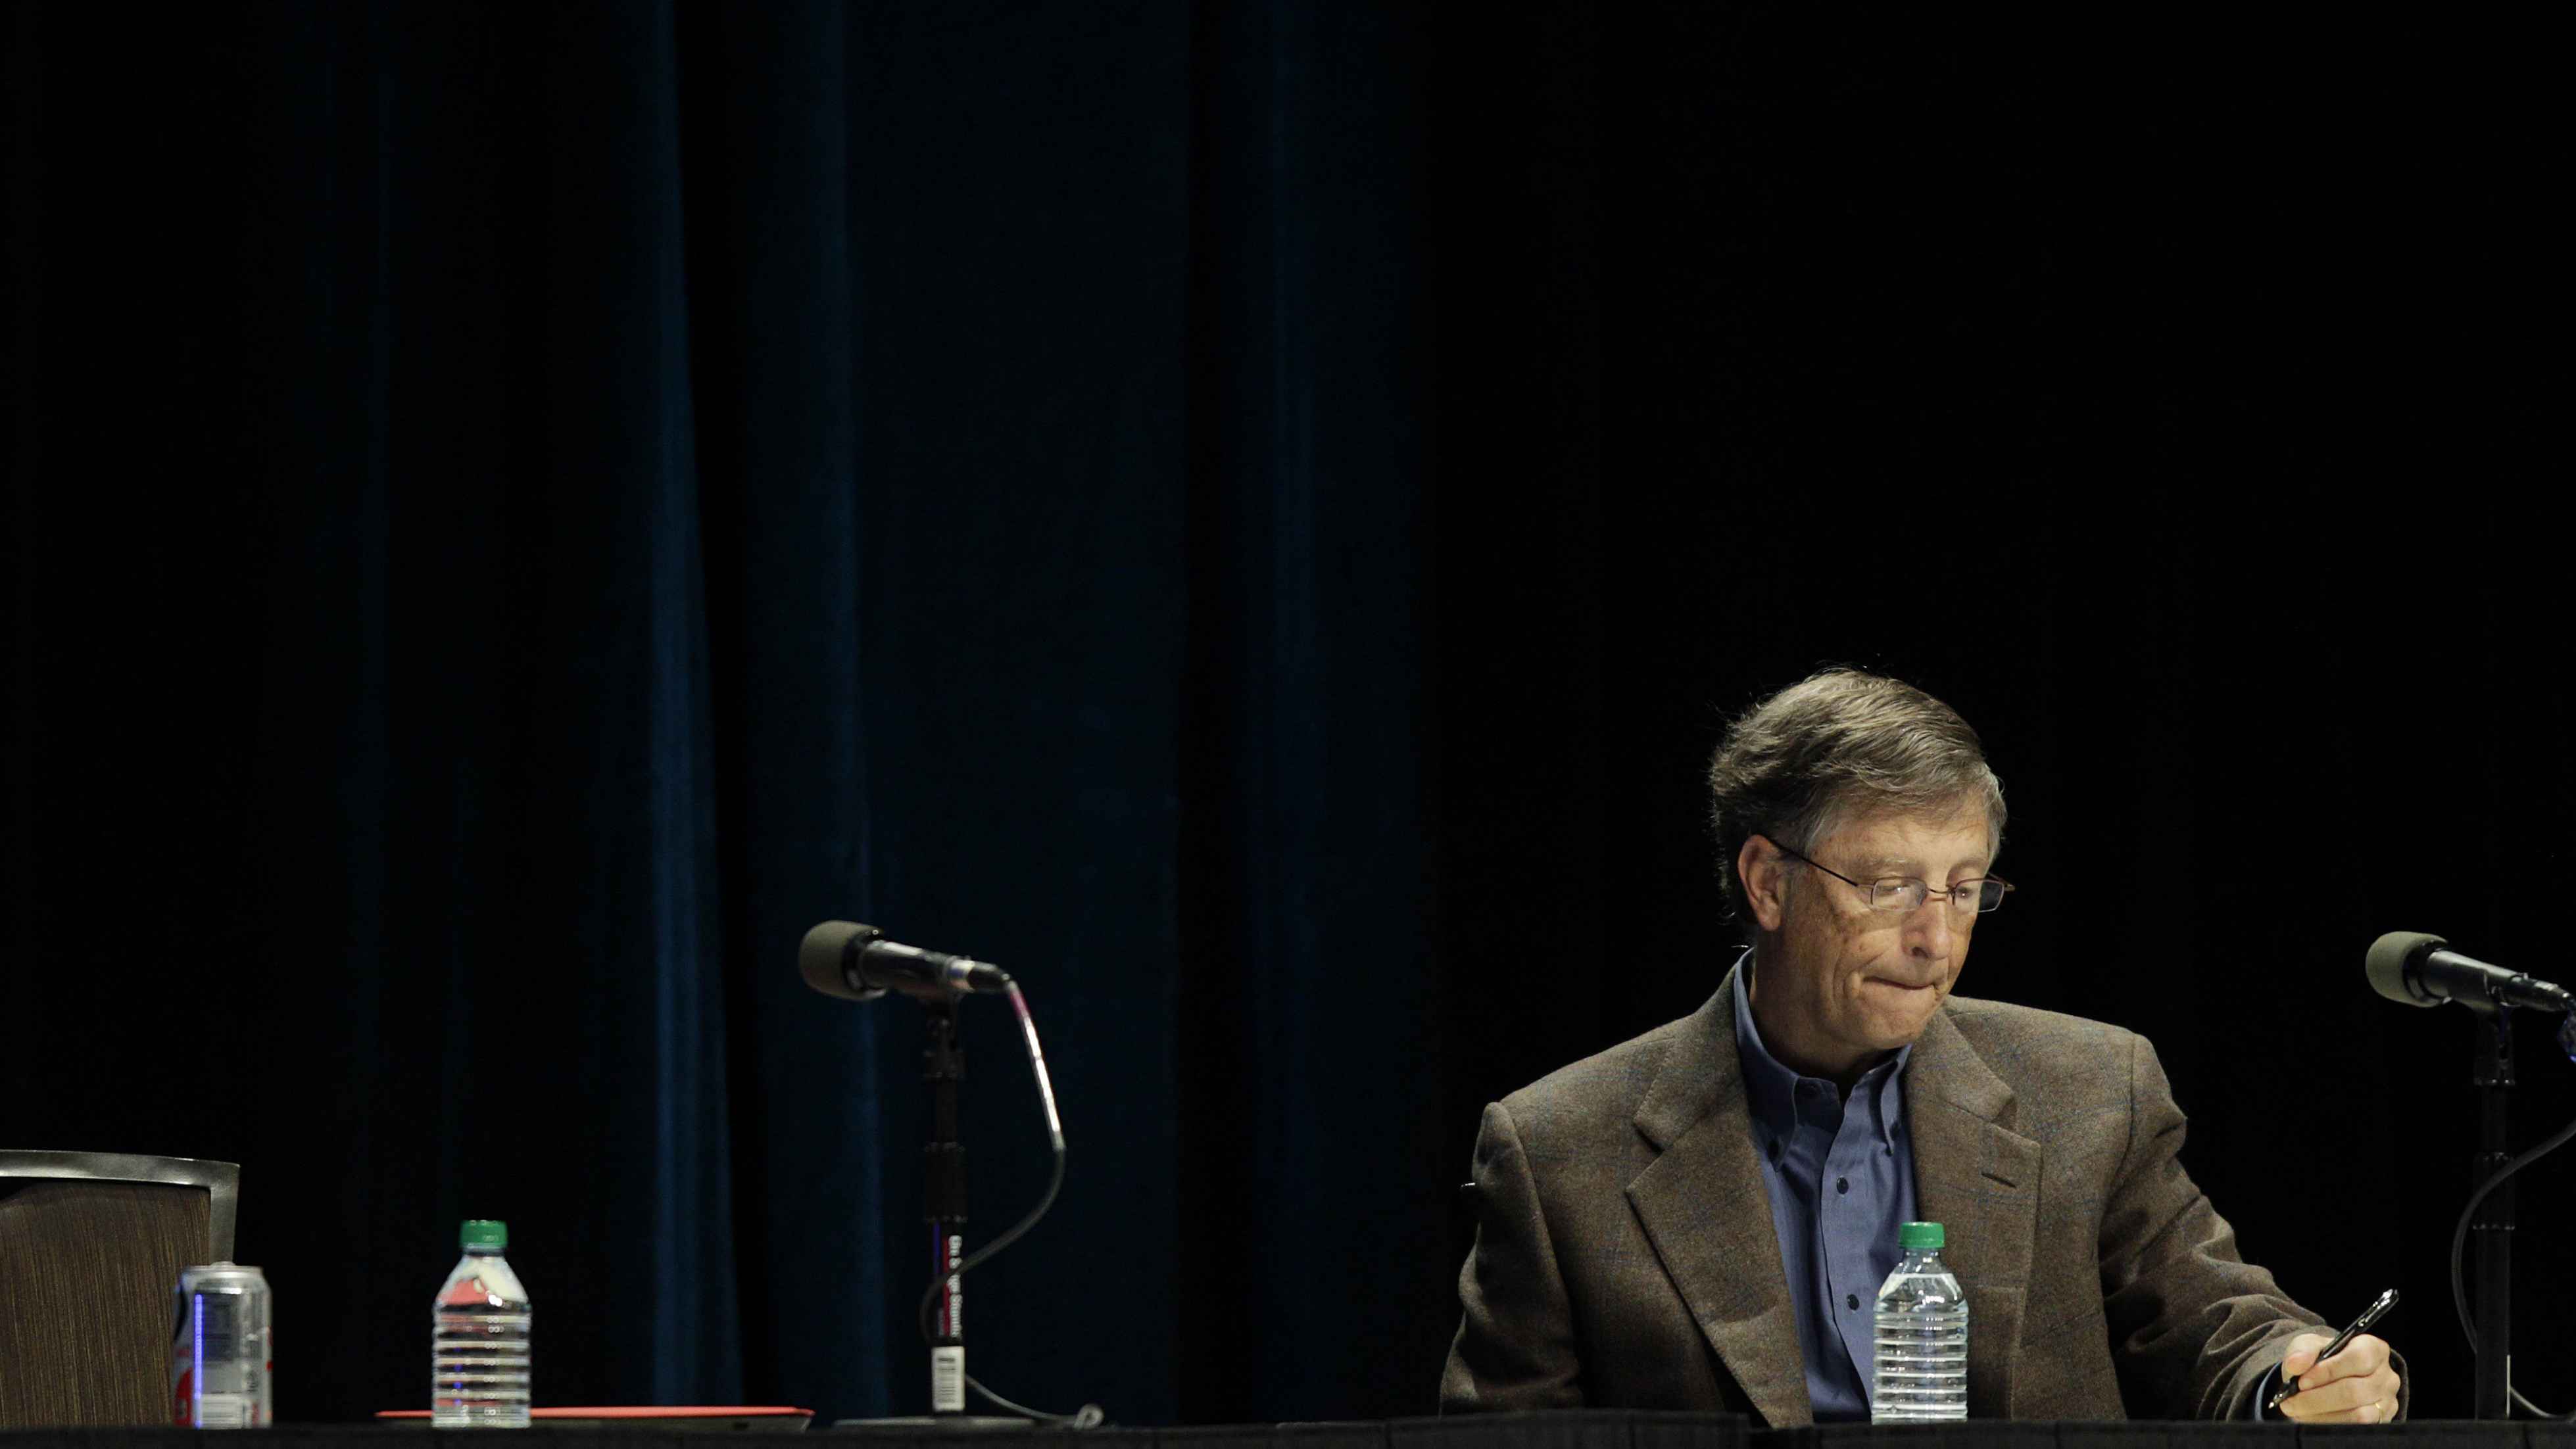 Microsoft's Bill Gates takes notes